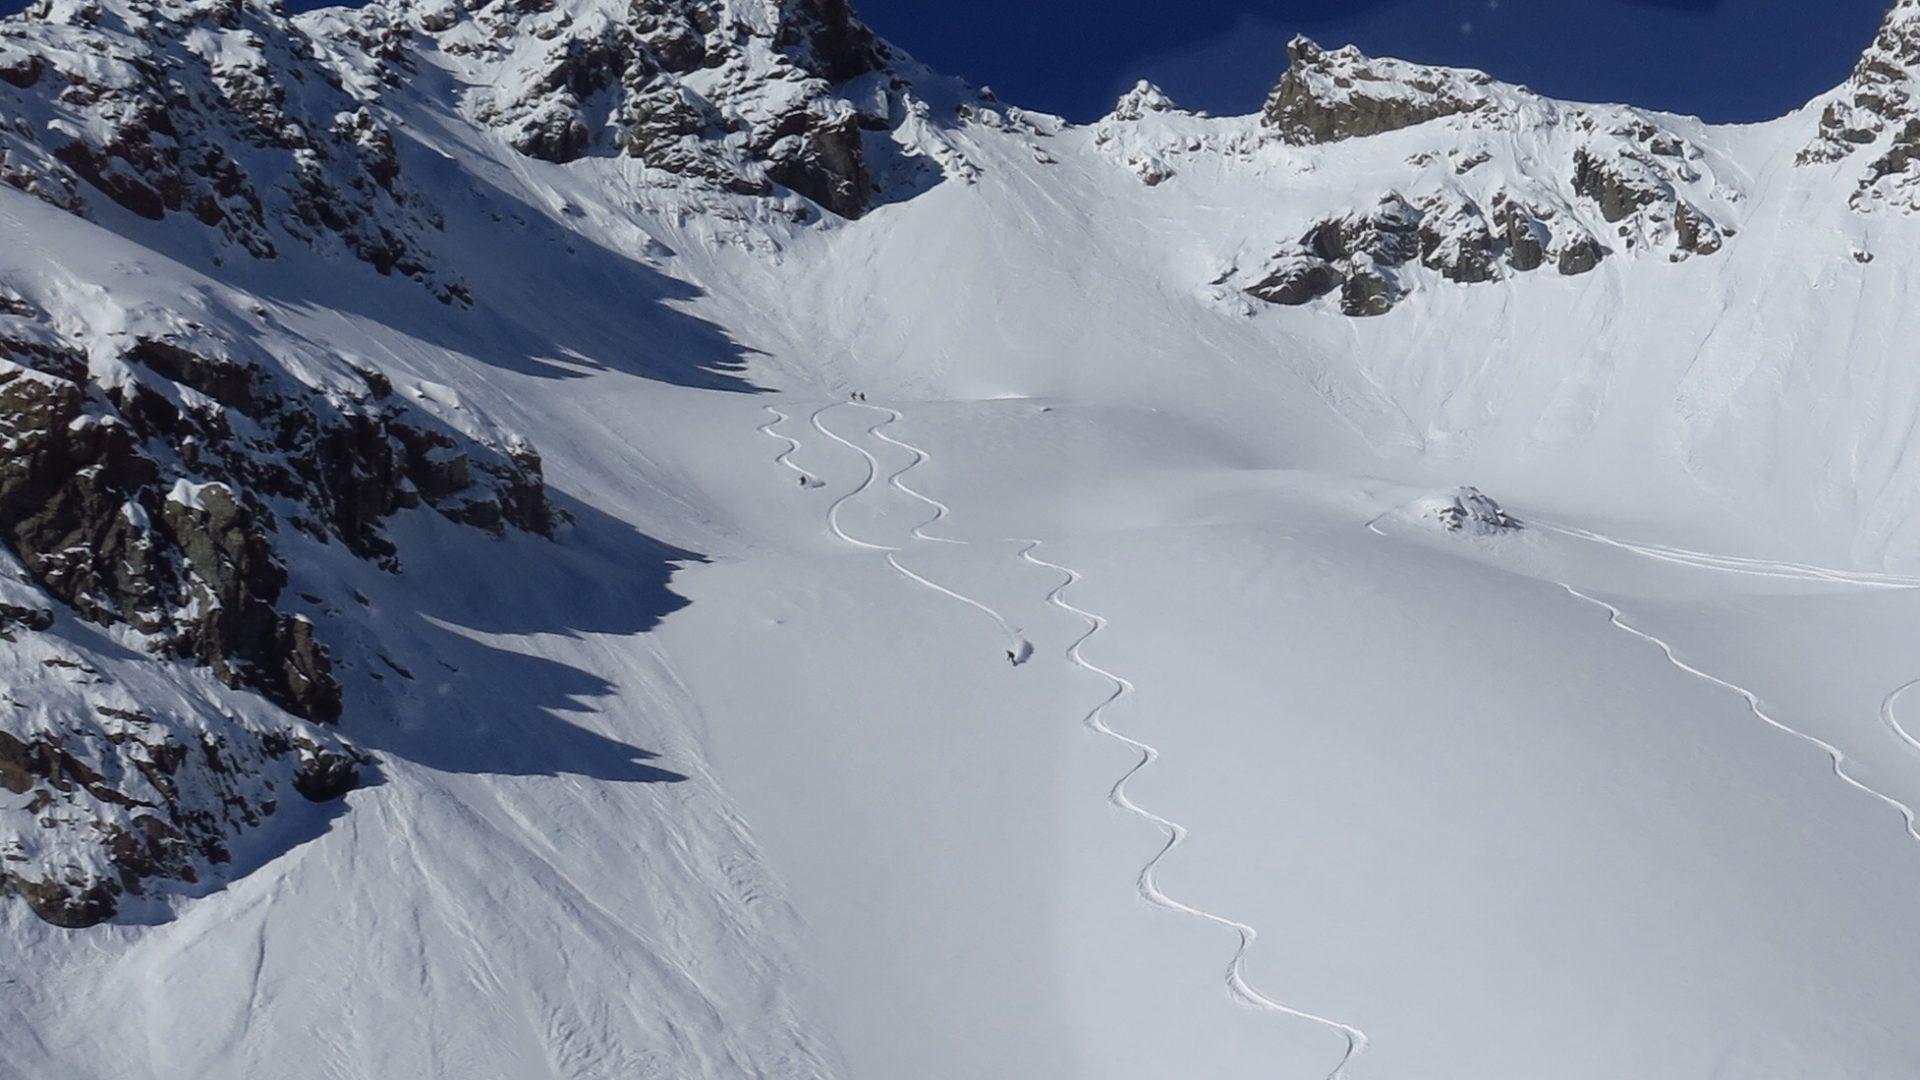 Fresh Snow - Fresh Lines